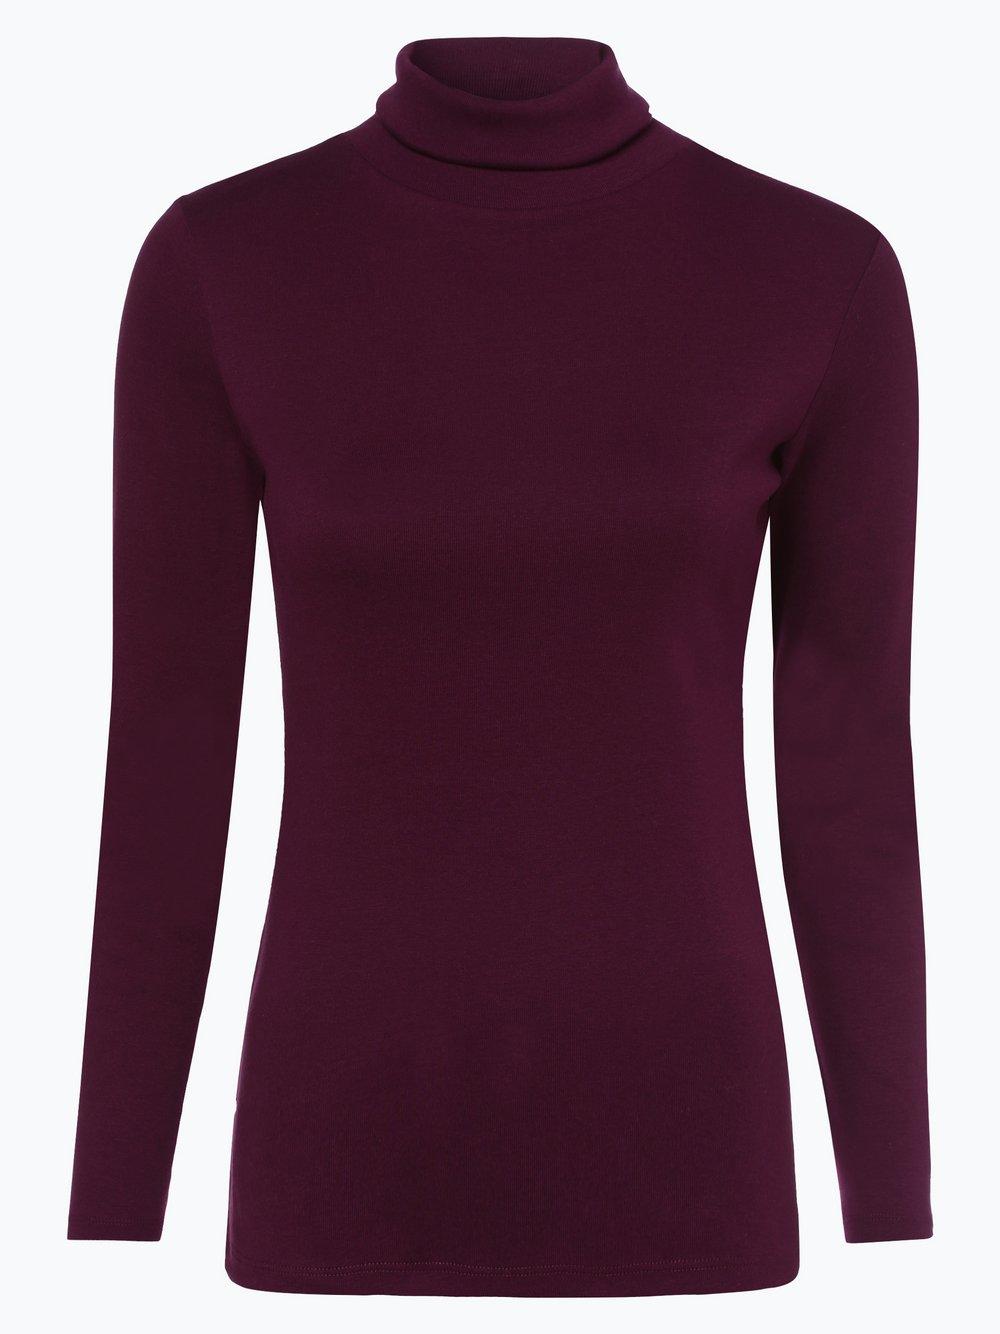 brookshire Damen Langarmshirt online kaufen   VANGRAAF.COM